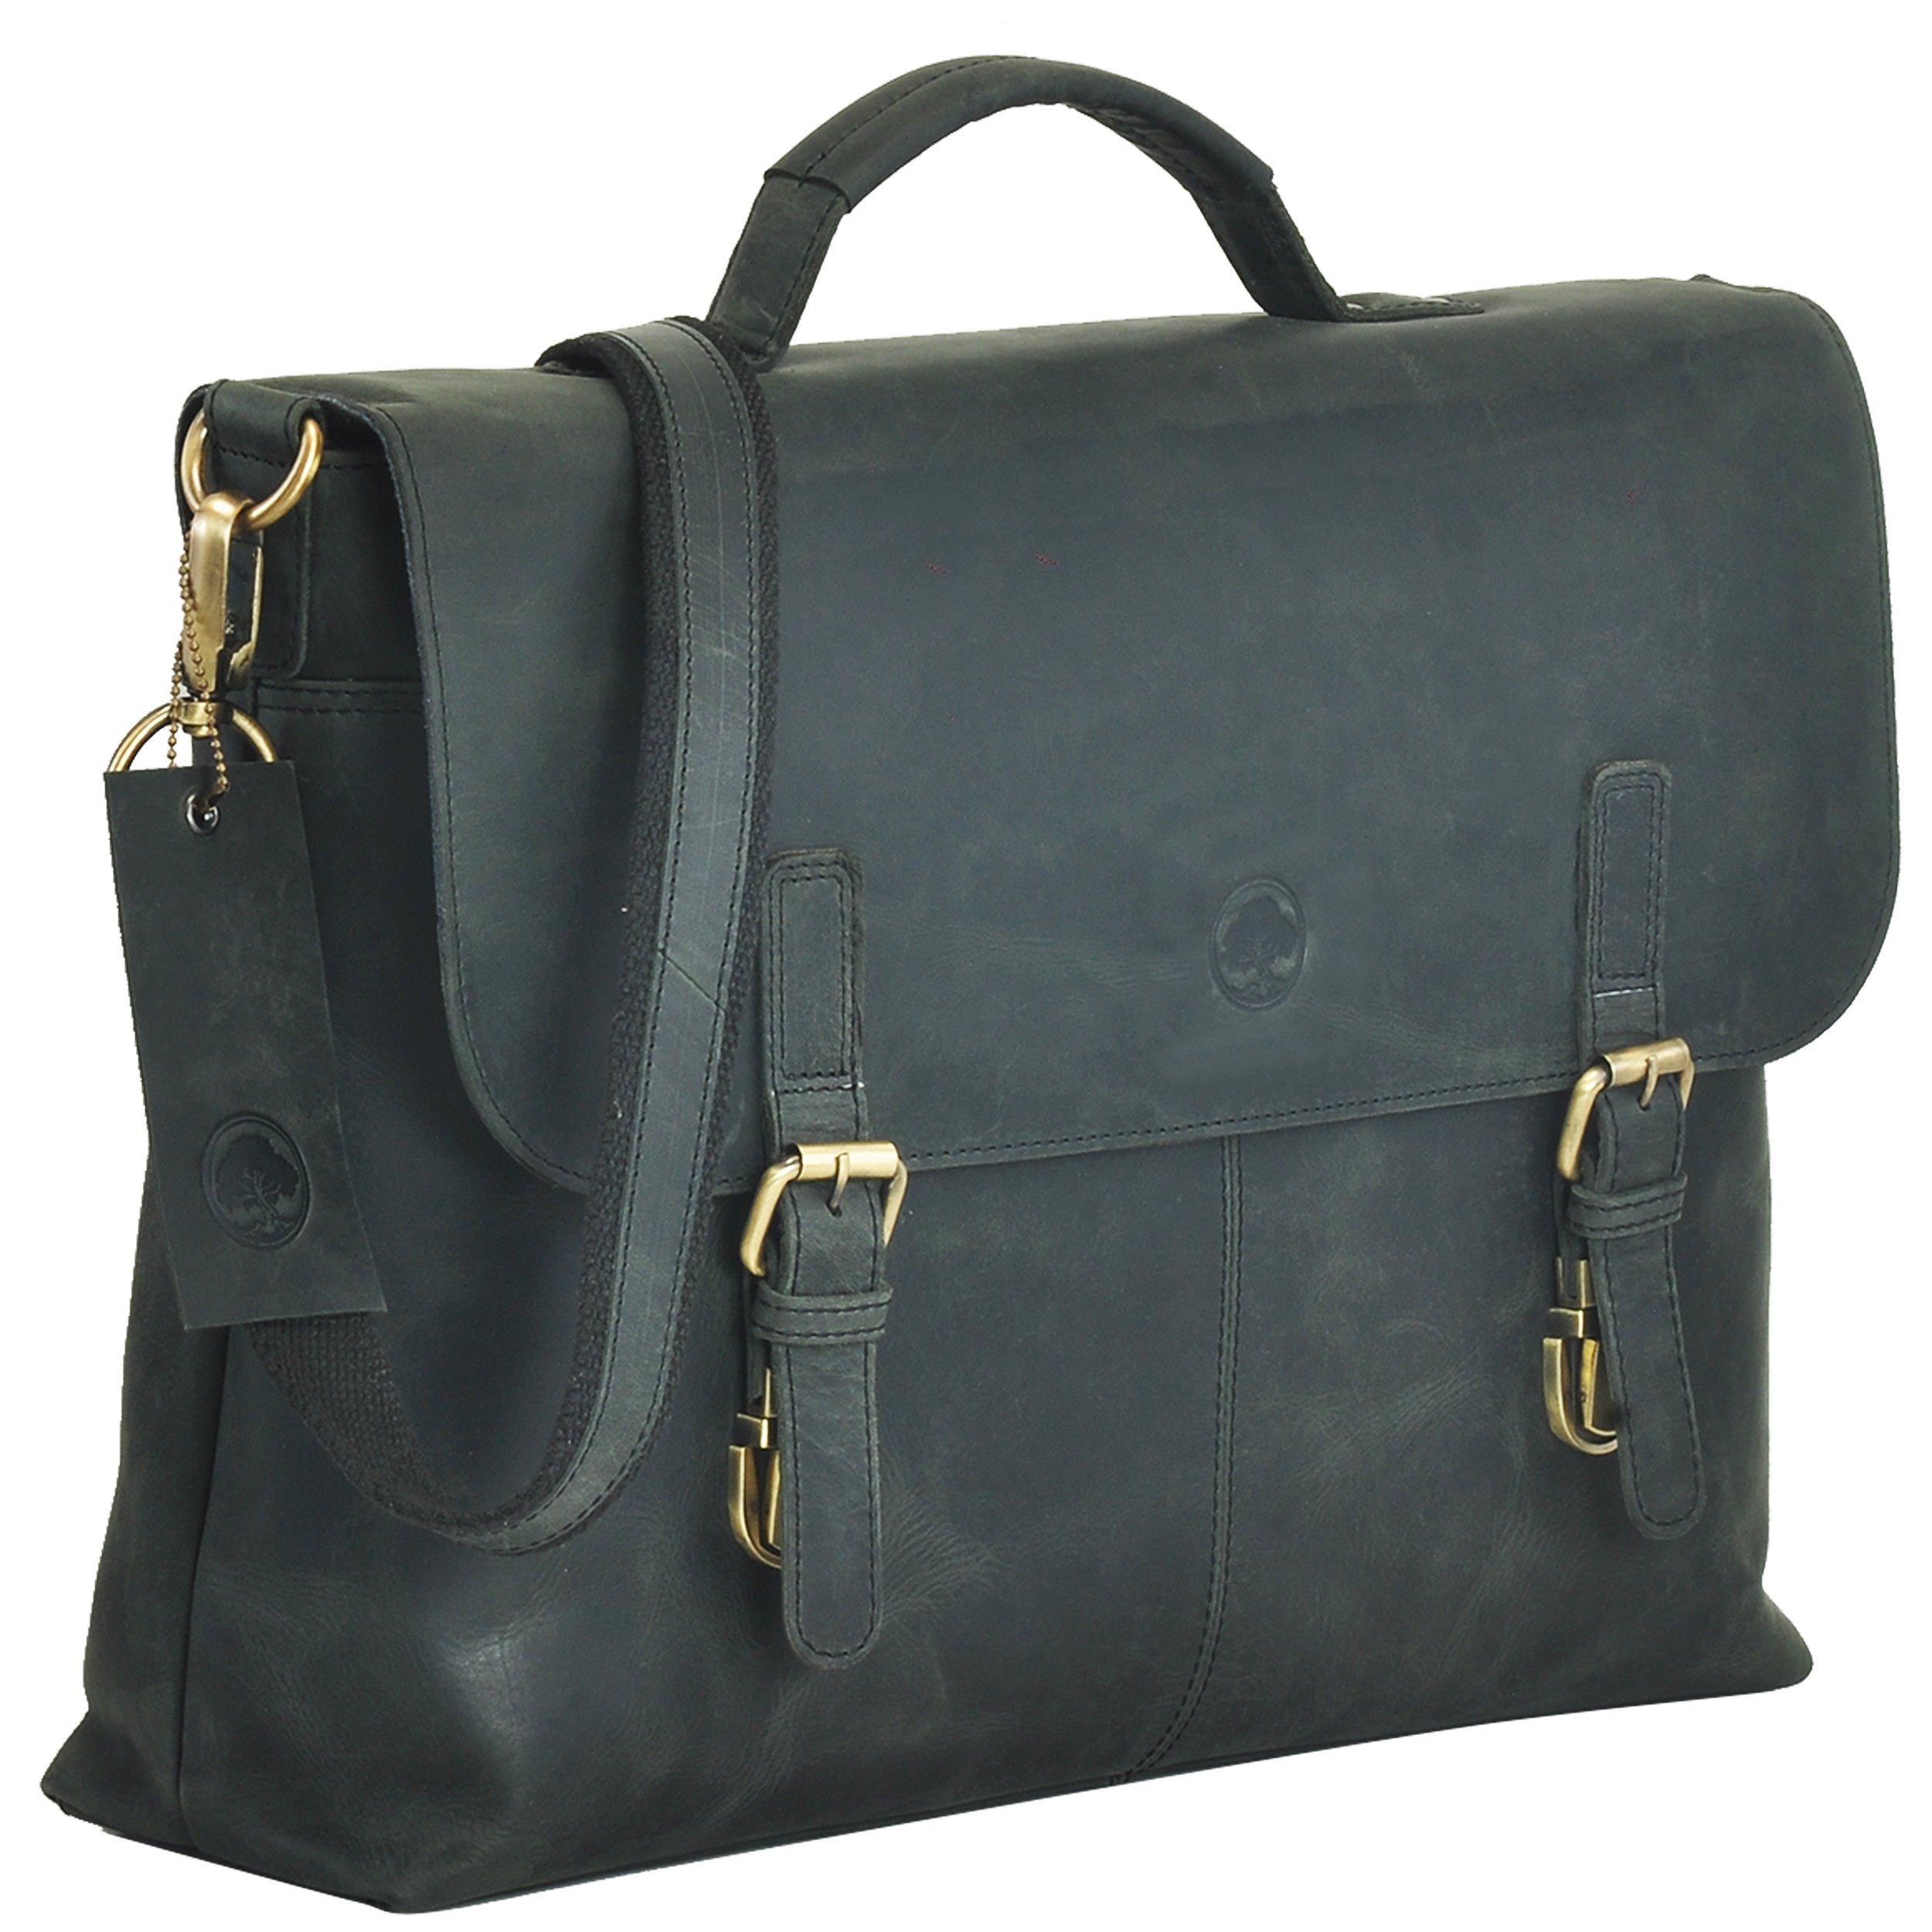 HOLIDAY DEALS !!! SALE TONY'S BAGS - Black 15.6 inch laptop bag Messenger bag Briefcase Unisex Bag Satchel Bag in Vintage Style